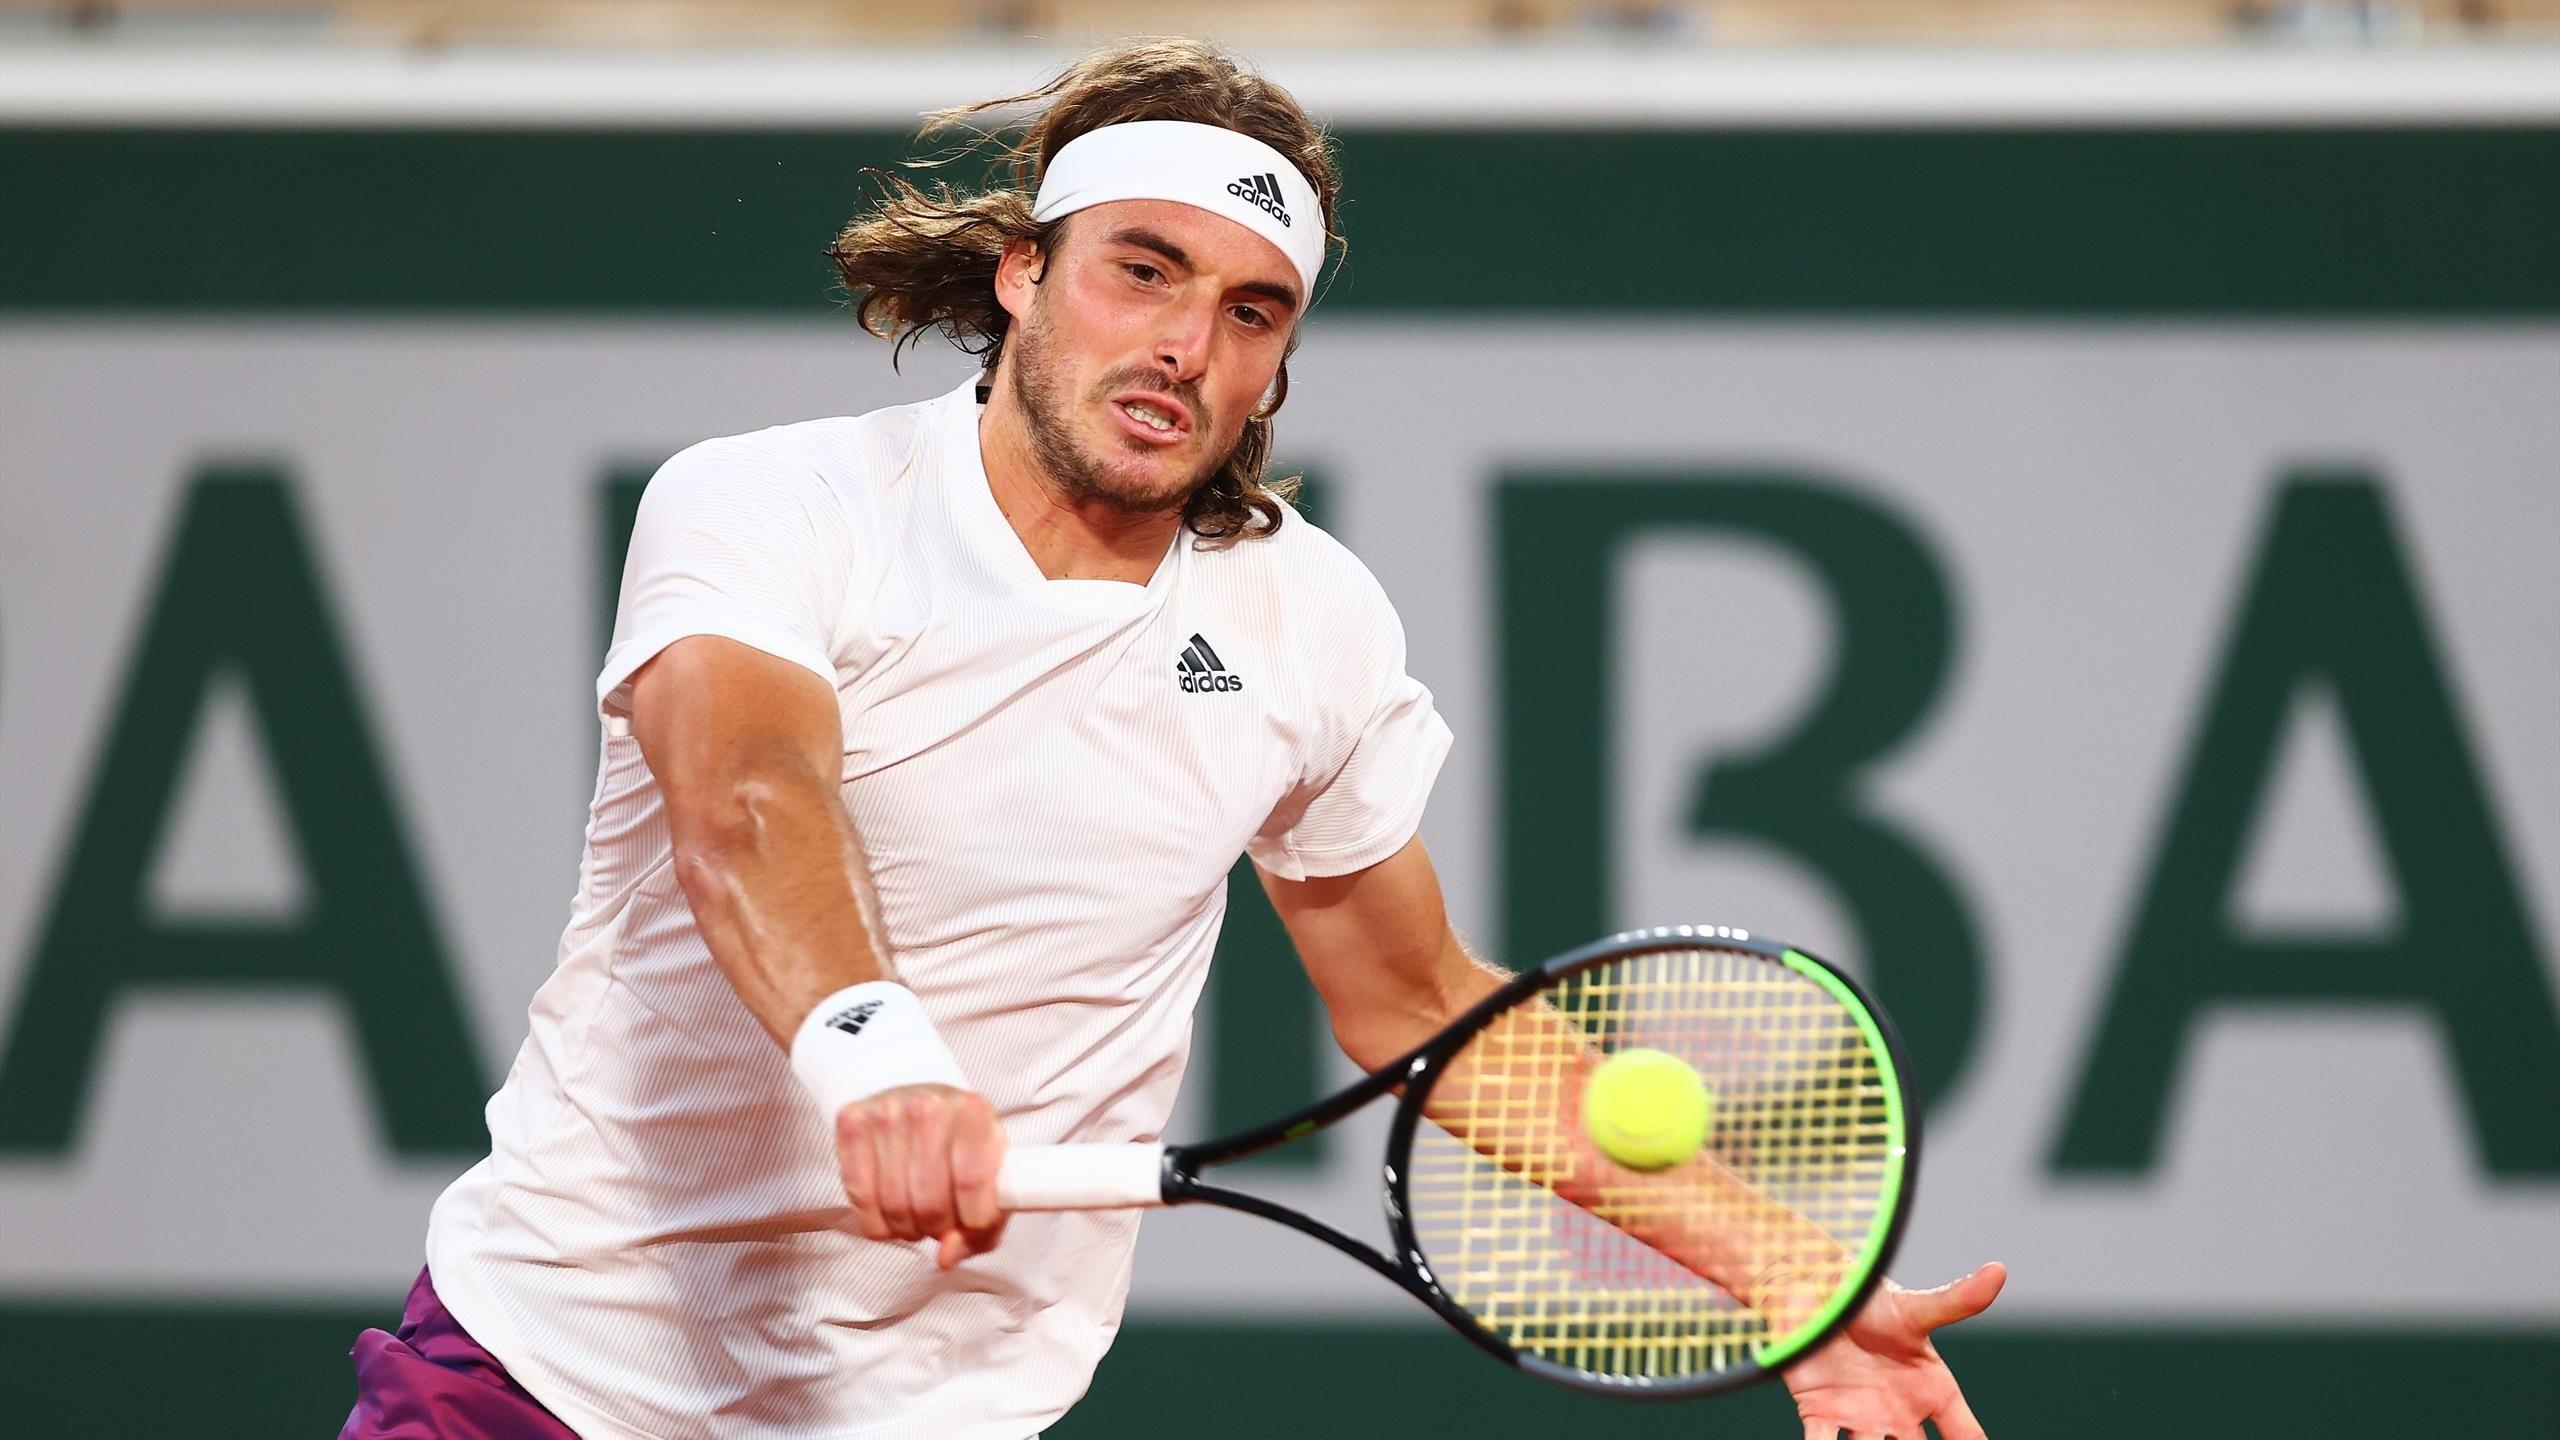 Roland Garros 2021: Stefanos Tsitsipas vs. Pedro Martinez Tennis Pick and Prediction